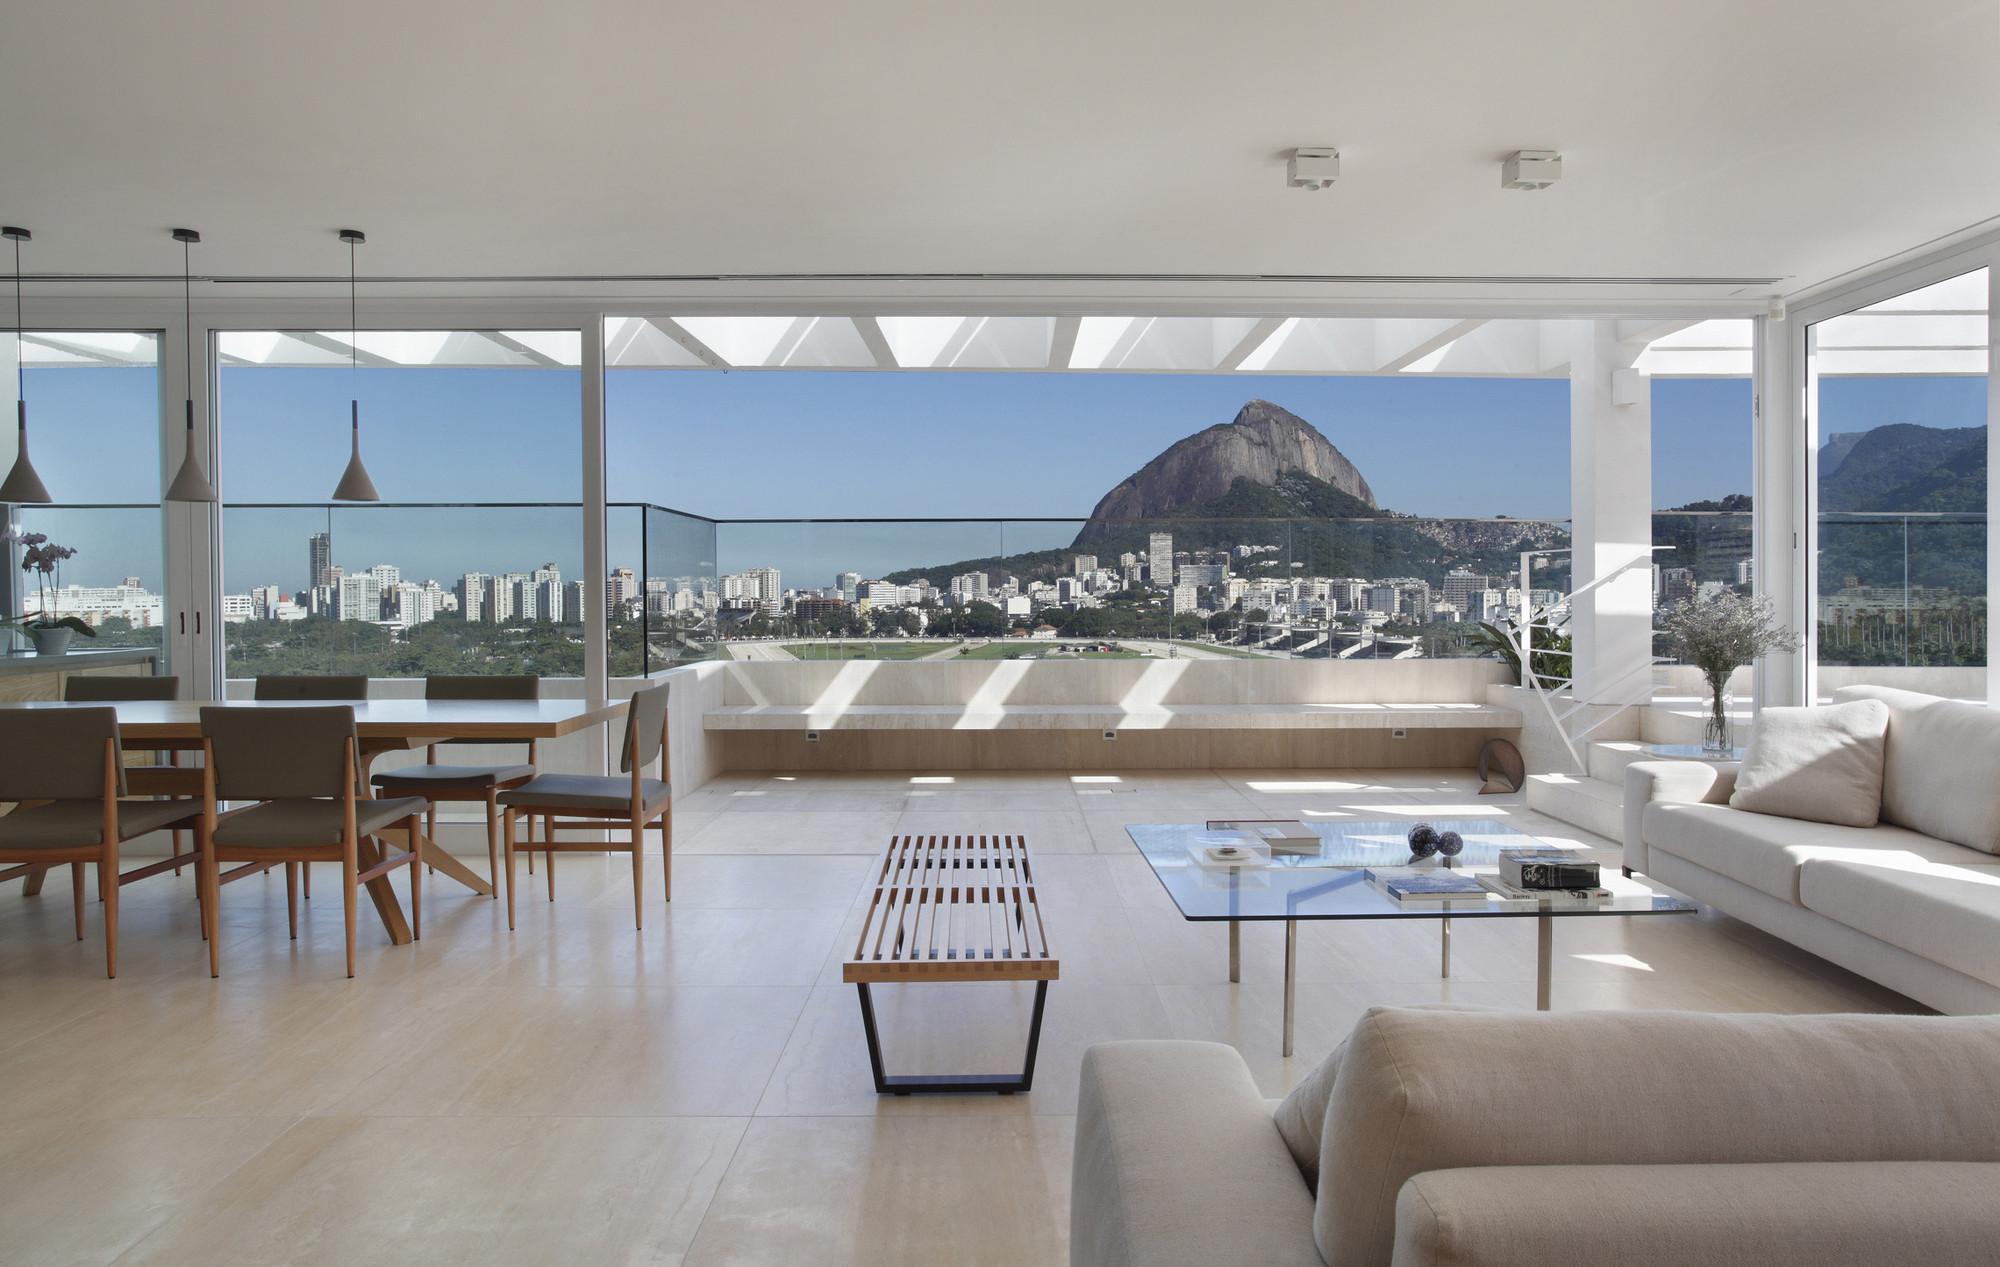 Jmf residence ivan rezende arquitetura archdaily Rio design hotel